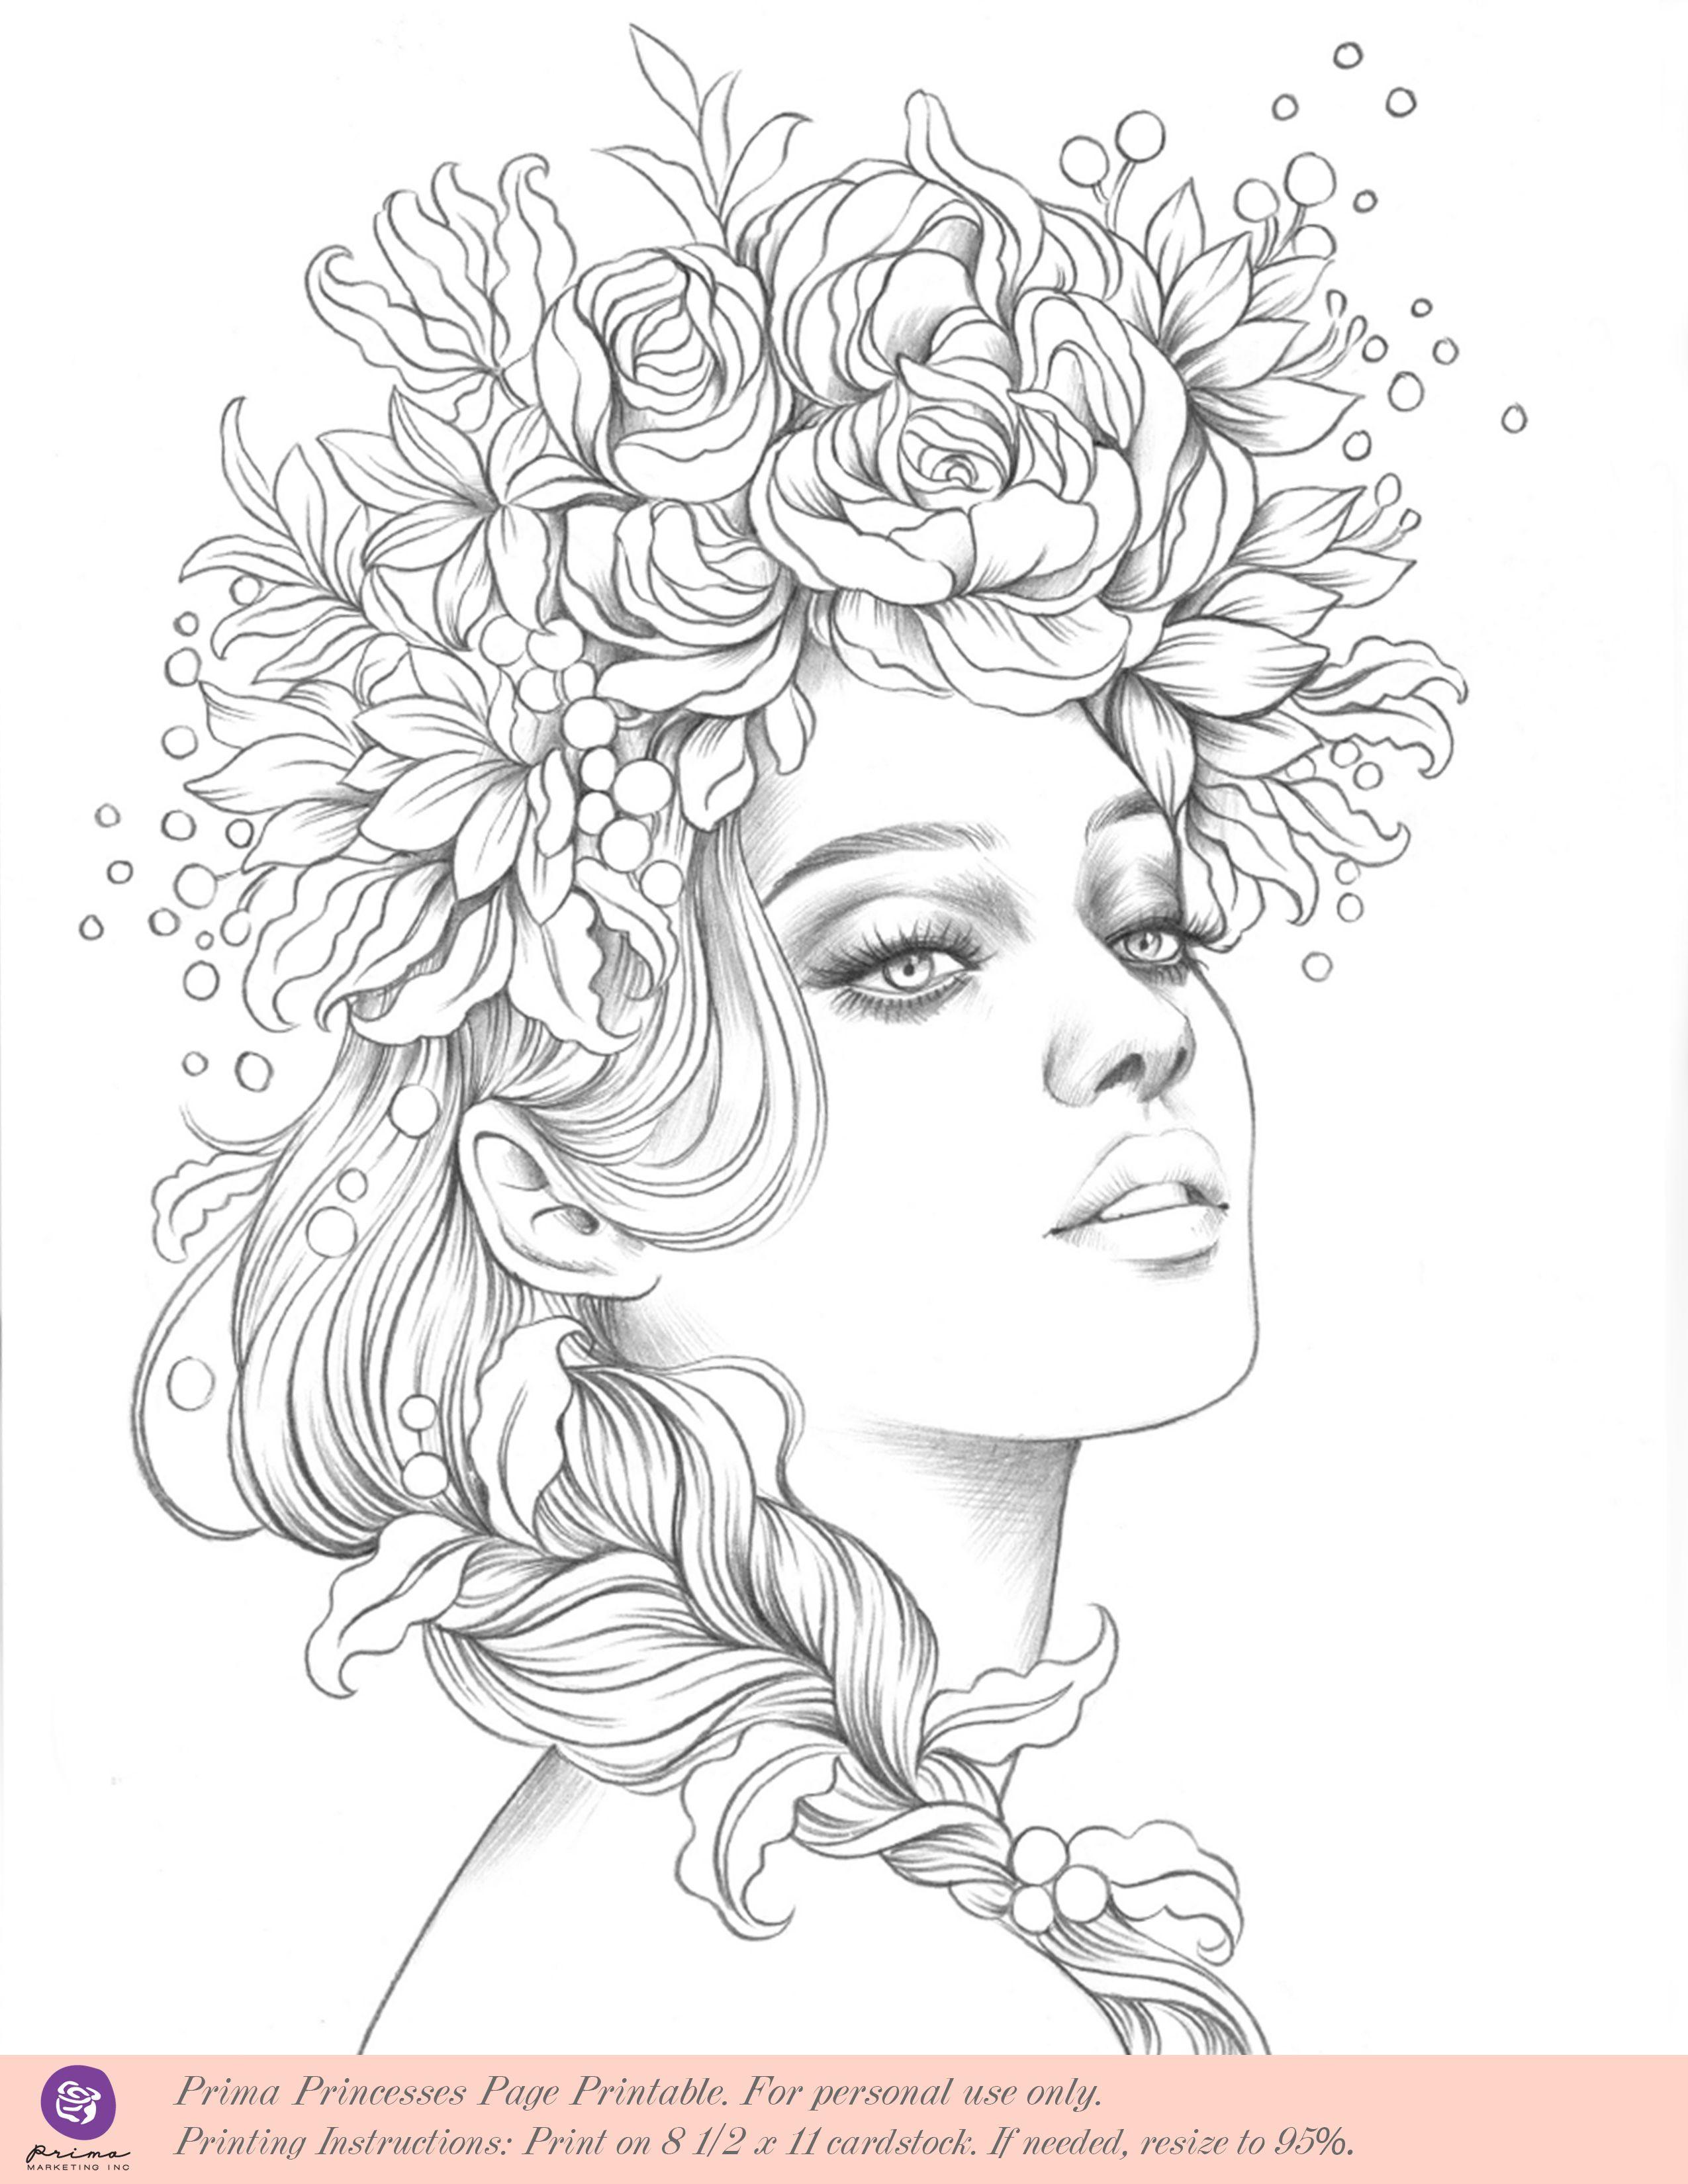 Belleza Dimensional Papercrafting | Illustrations | Pinterest ...